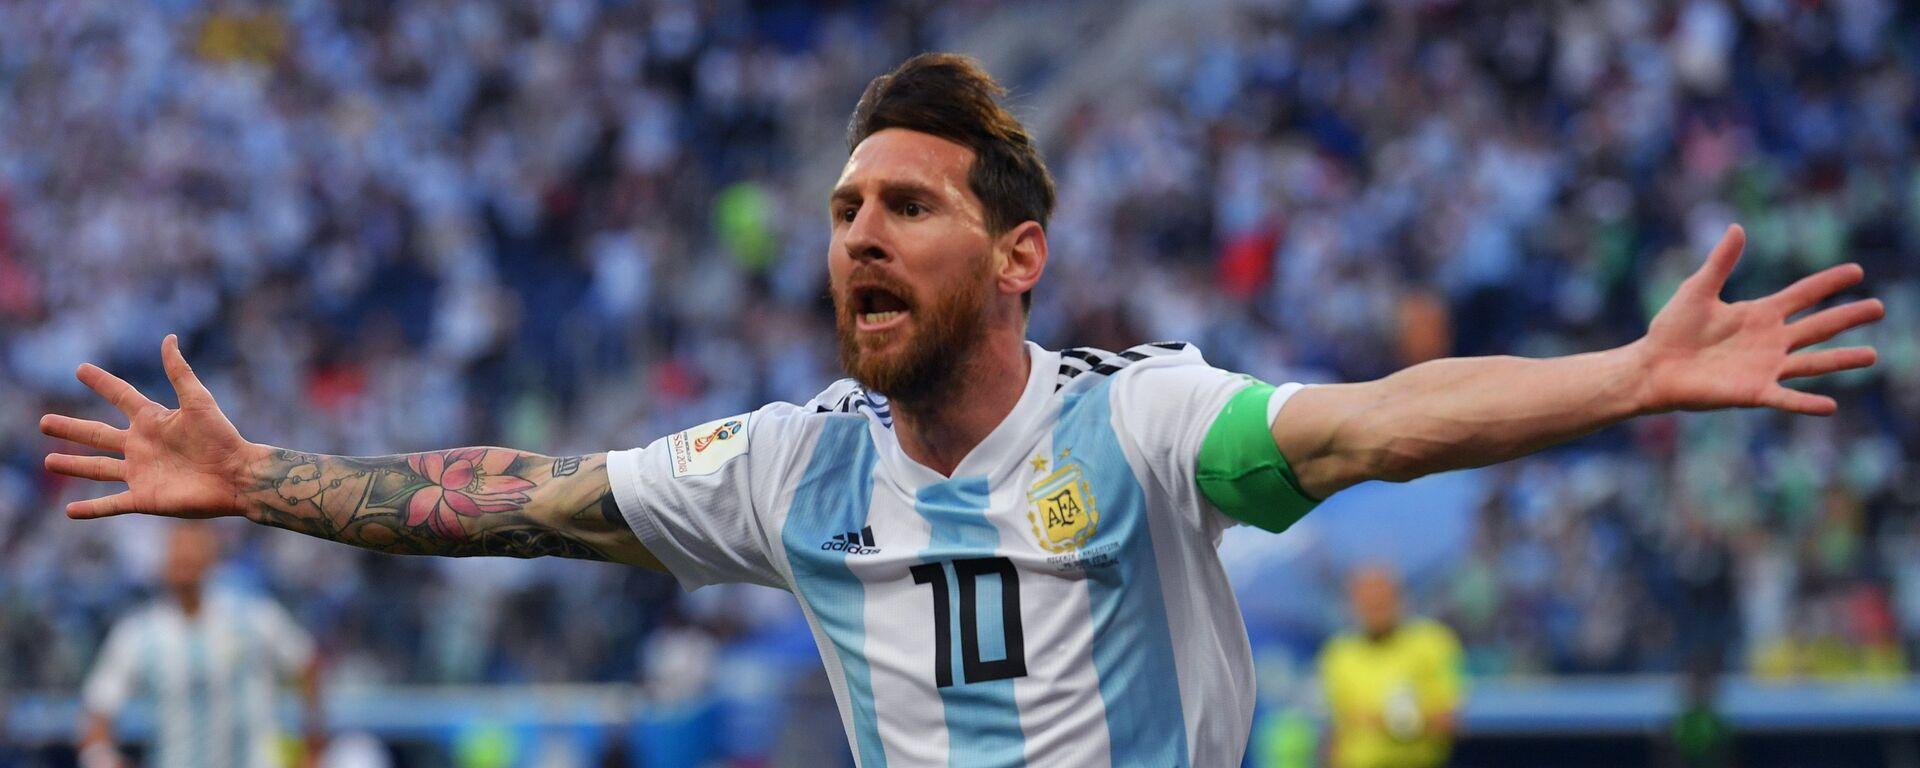 Lionel Messi celebra un goal - Sputnik Italia, 1920, 07.08.2021